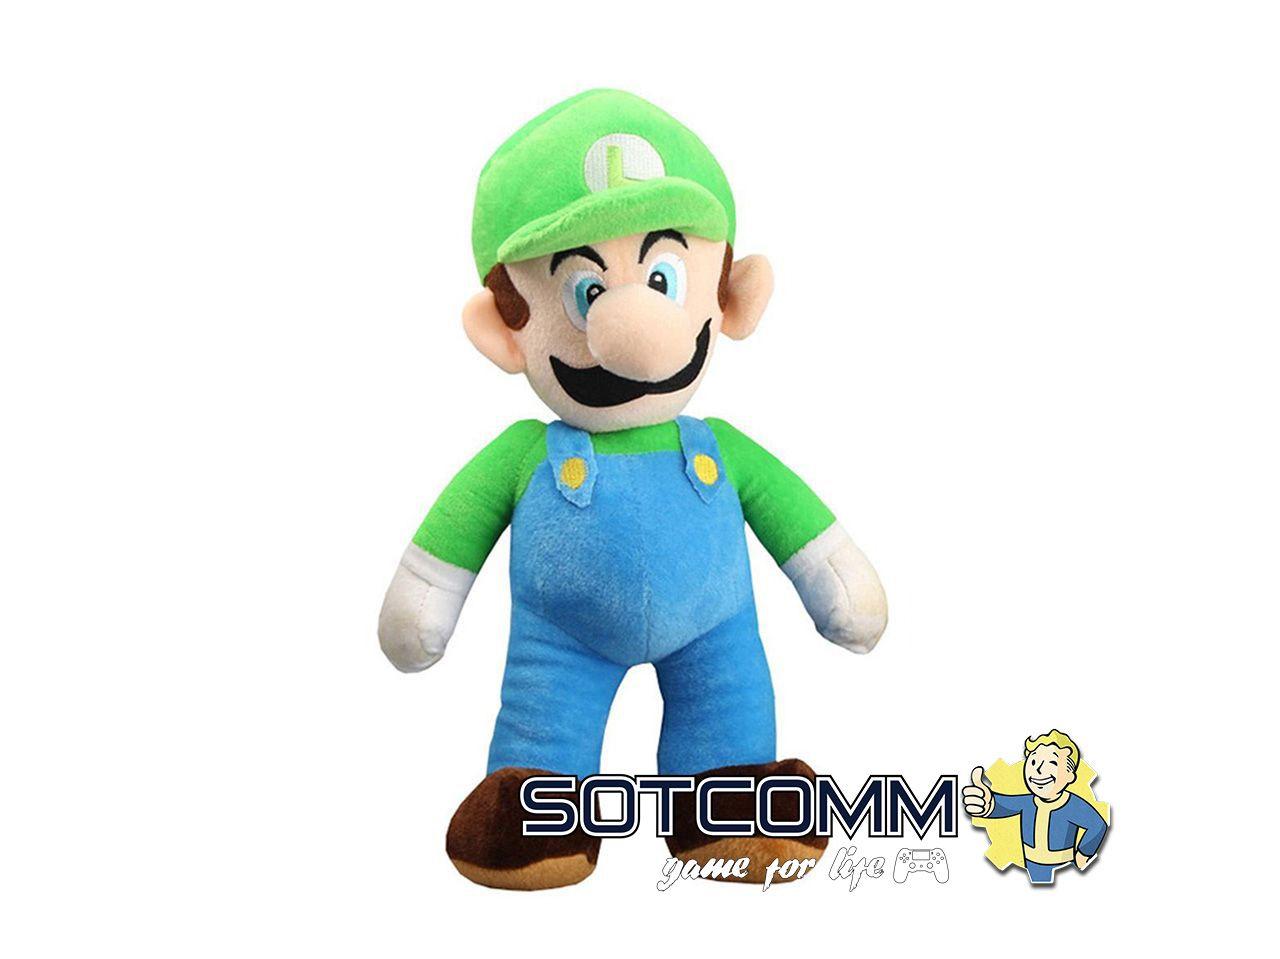 Super Mario: плюшевый Луиджи 25 см